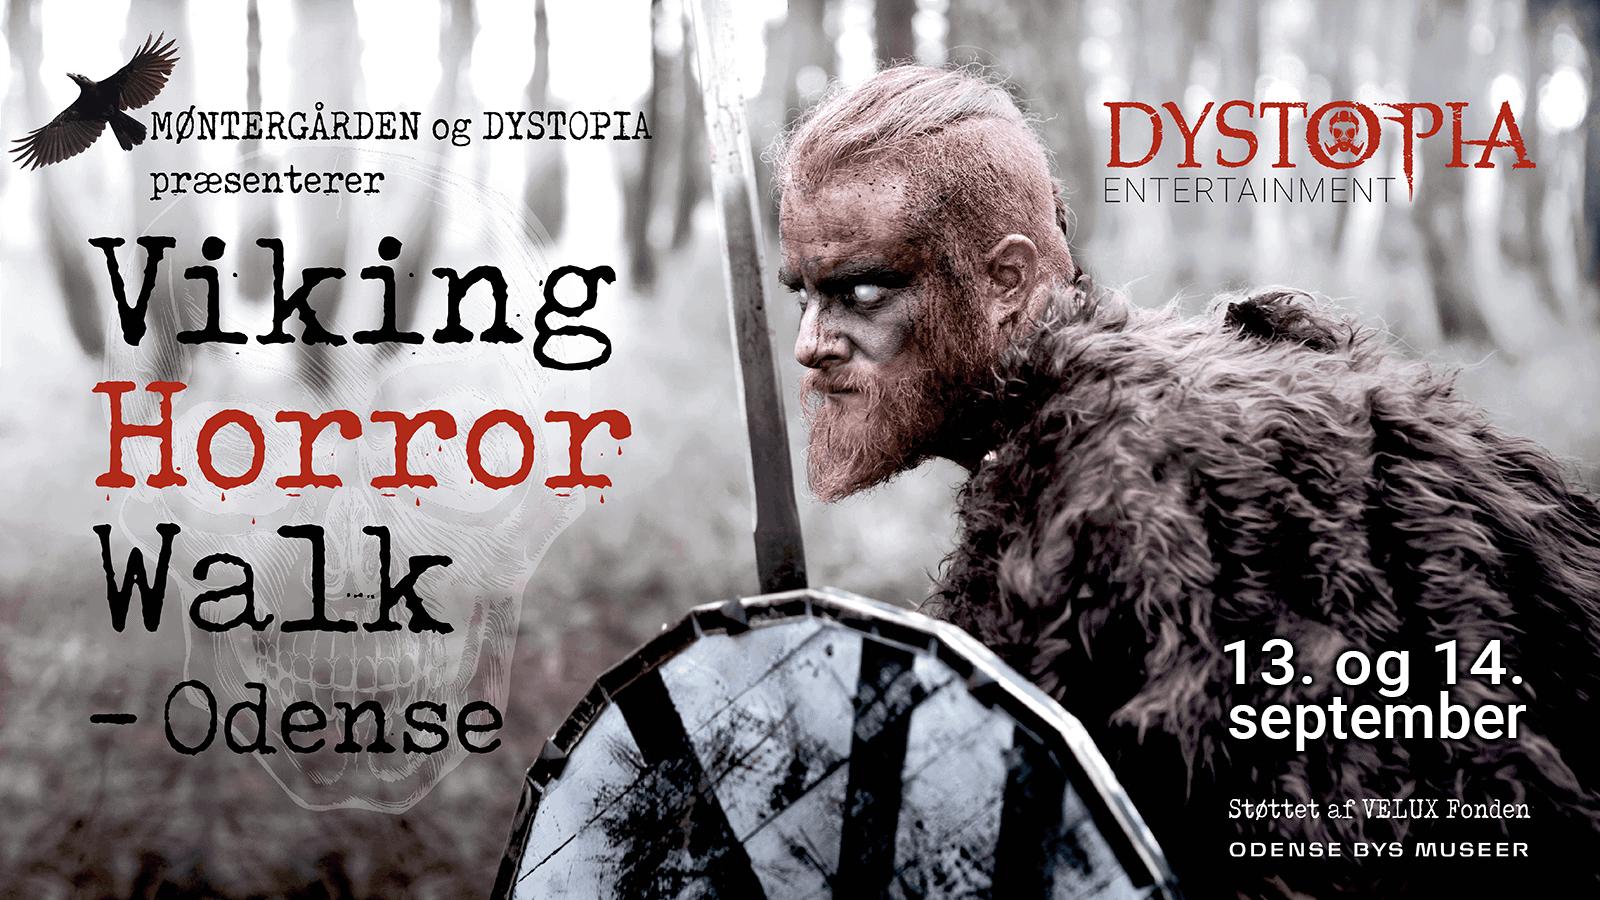 Viking Horror Walk Odense Bys Museer